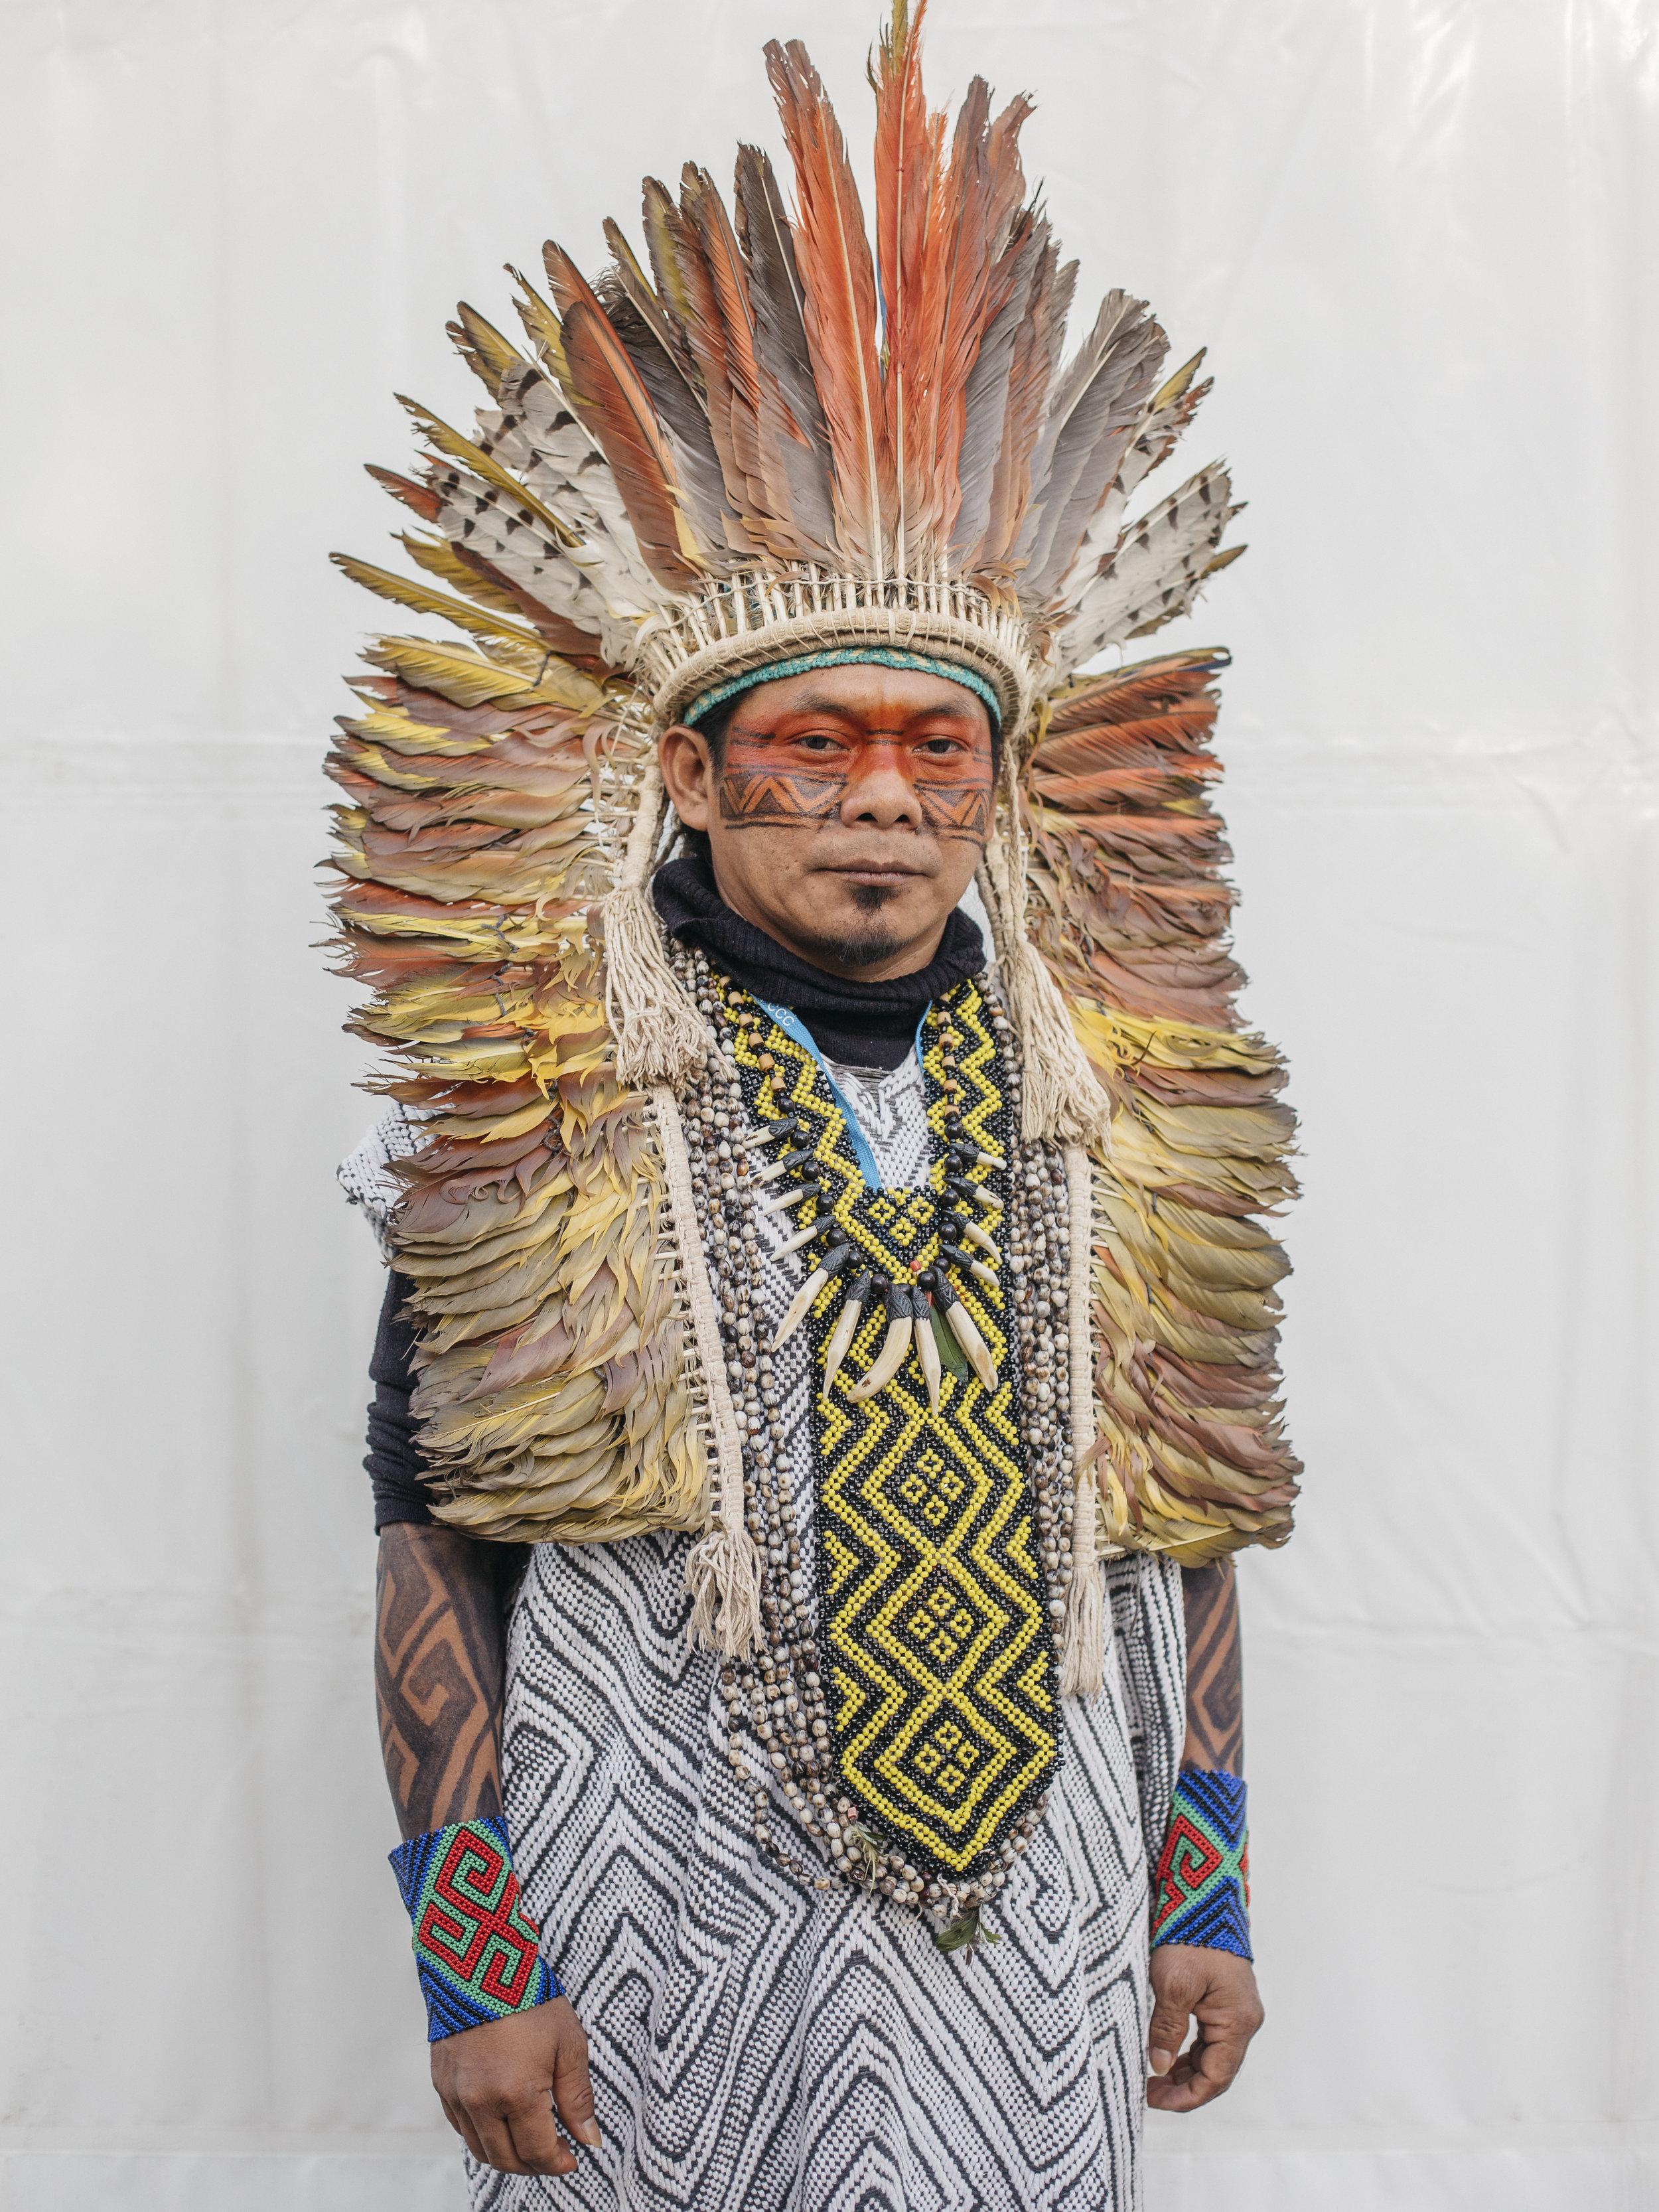 Ninawá Huni Kui, president of the Huni Kui people from Brazil.